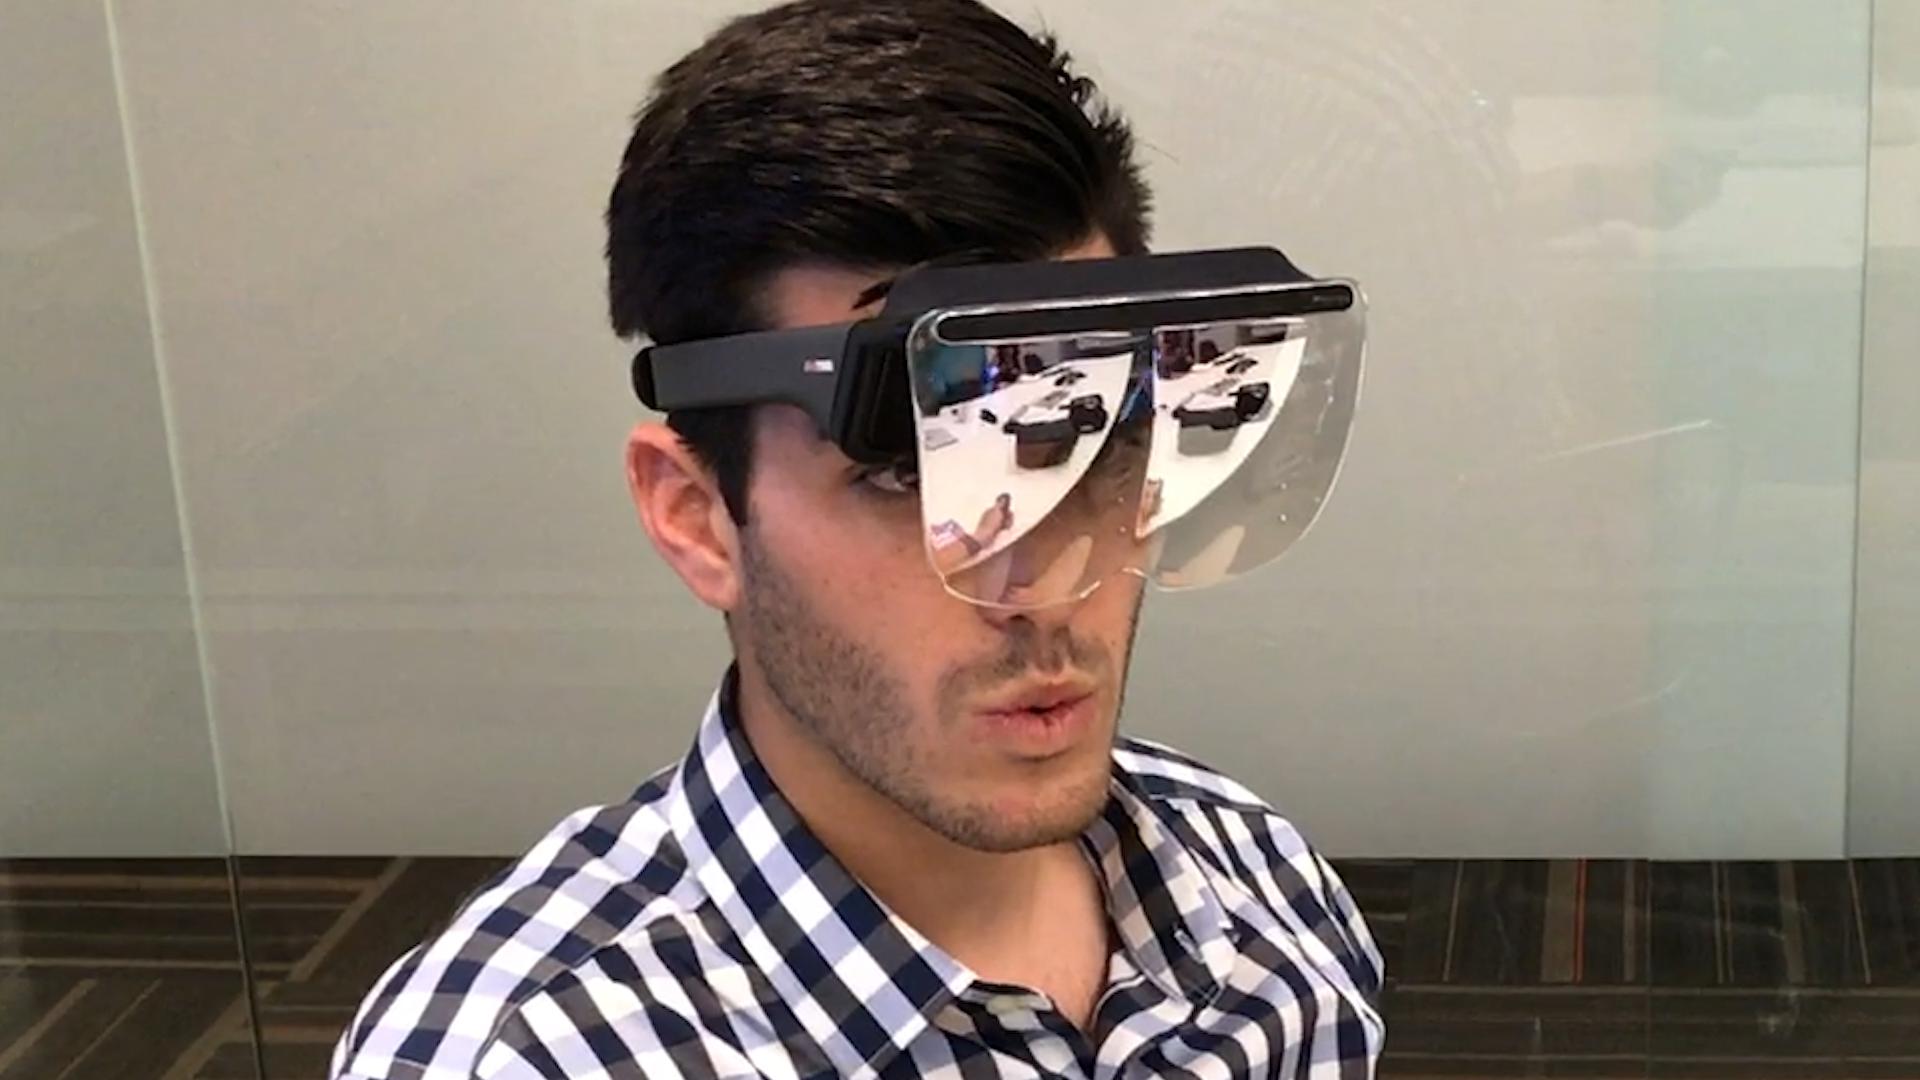 Mira AR headset